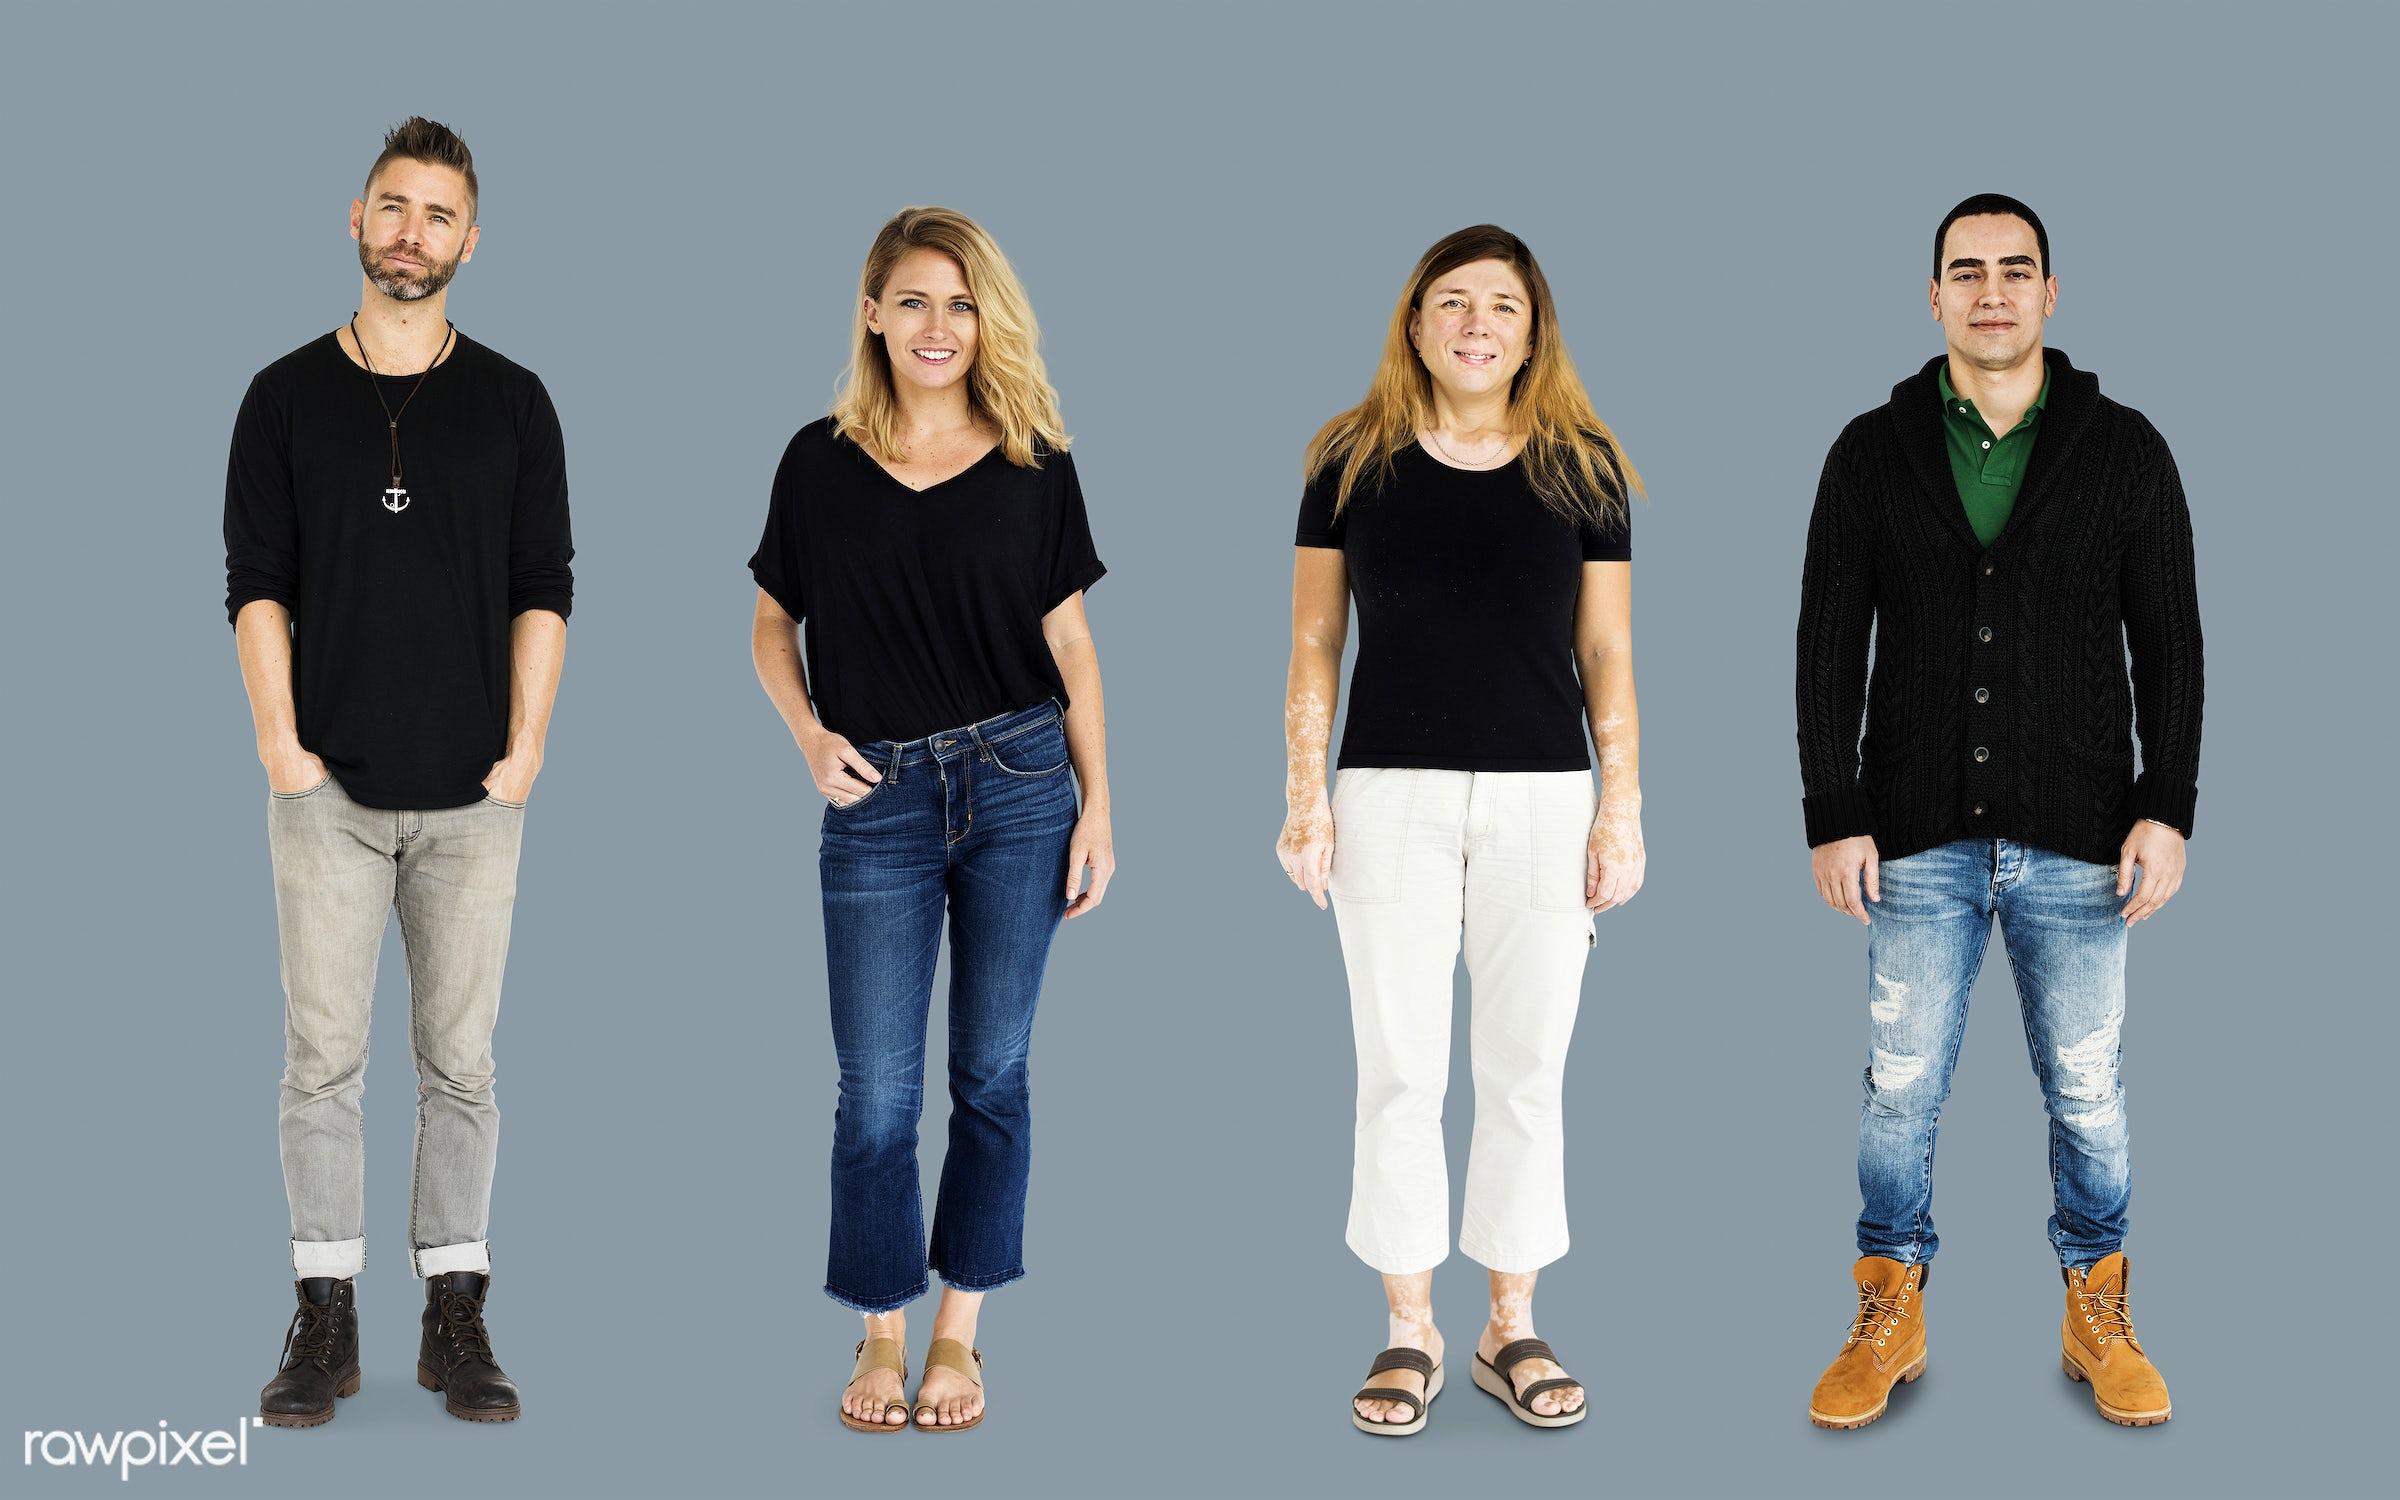 gentlemen, studio, person, diverse, set, tee, people, attraction, together, caucasian, black shirt, life, woman, attractive...